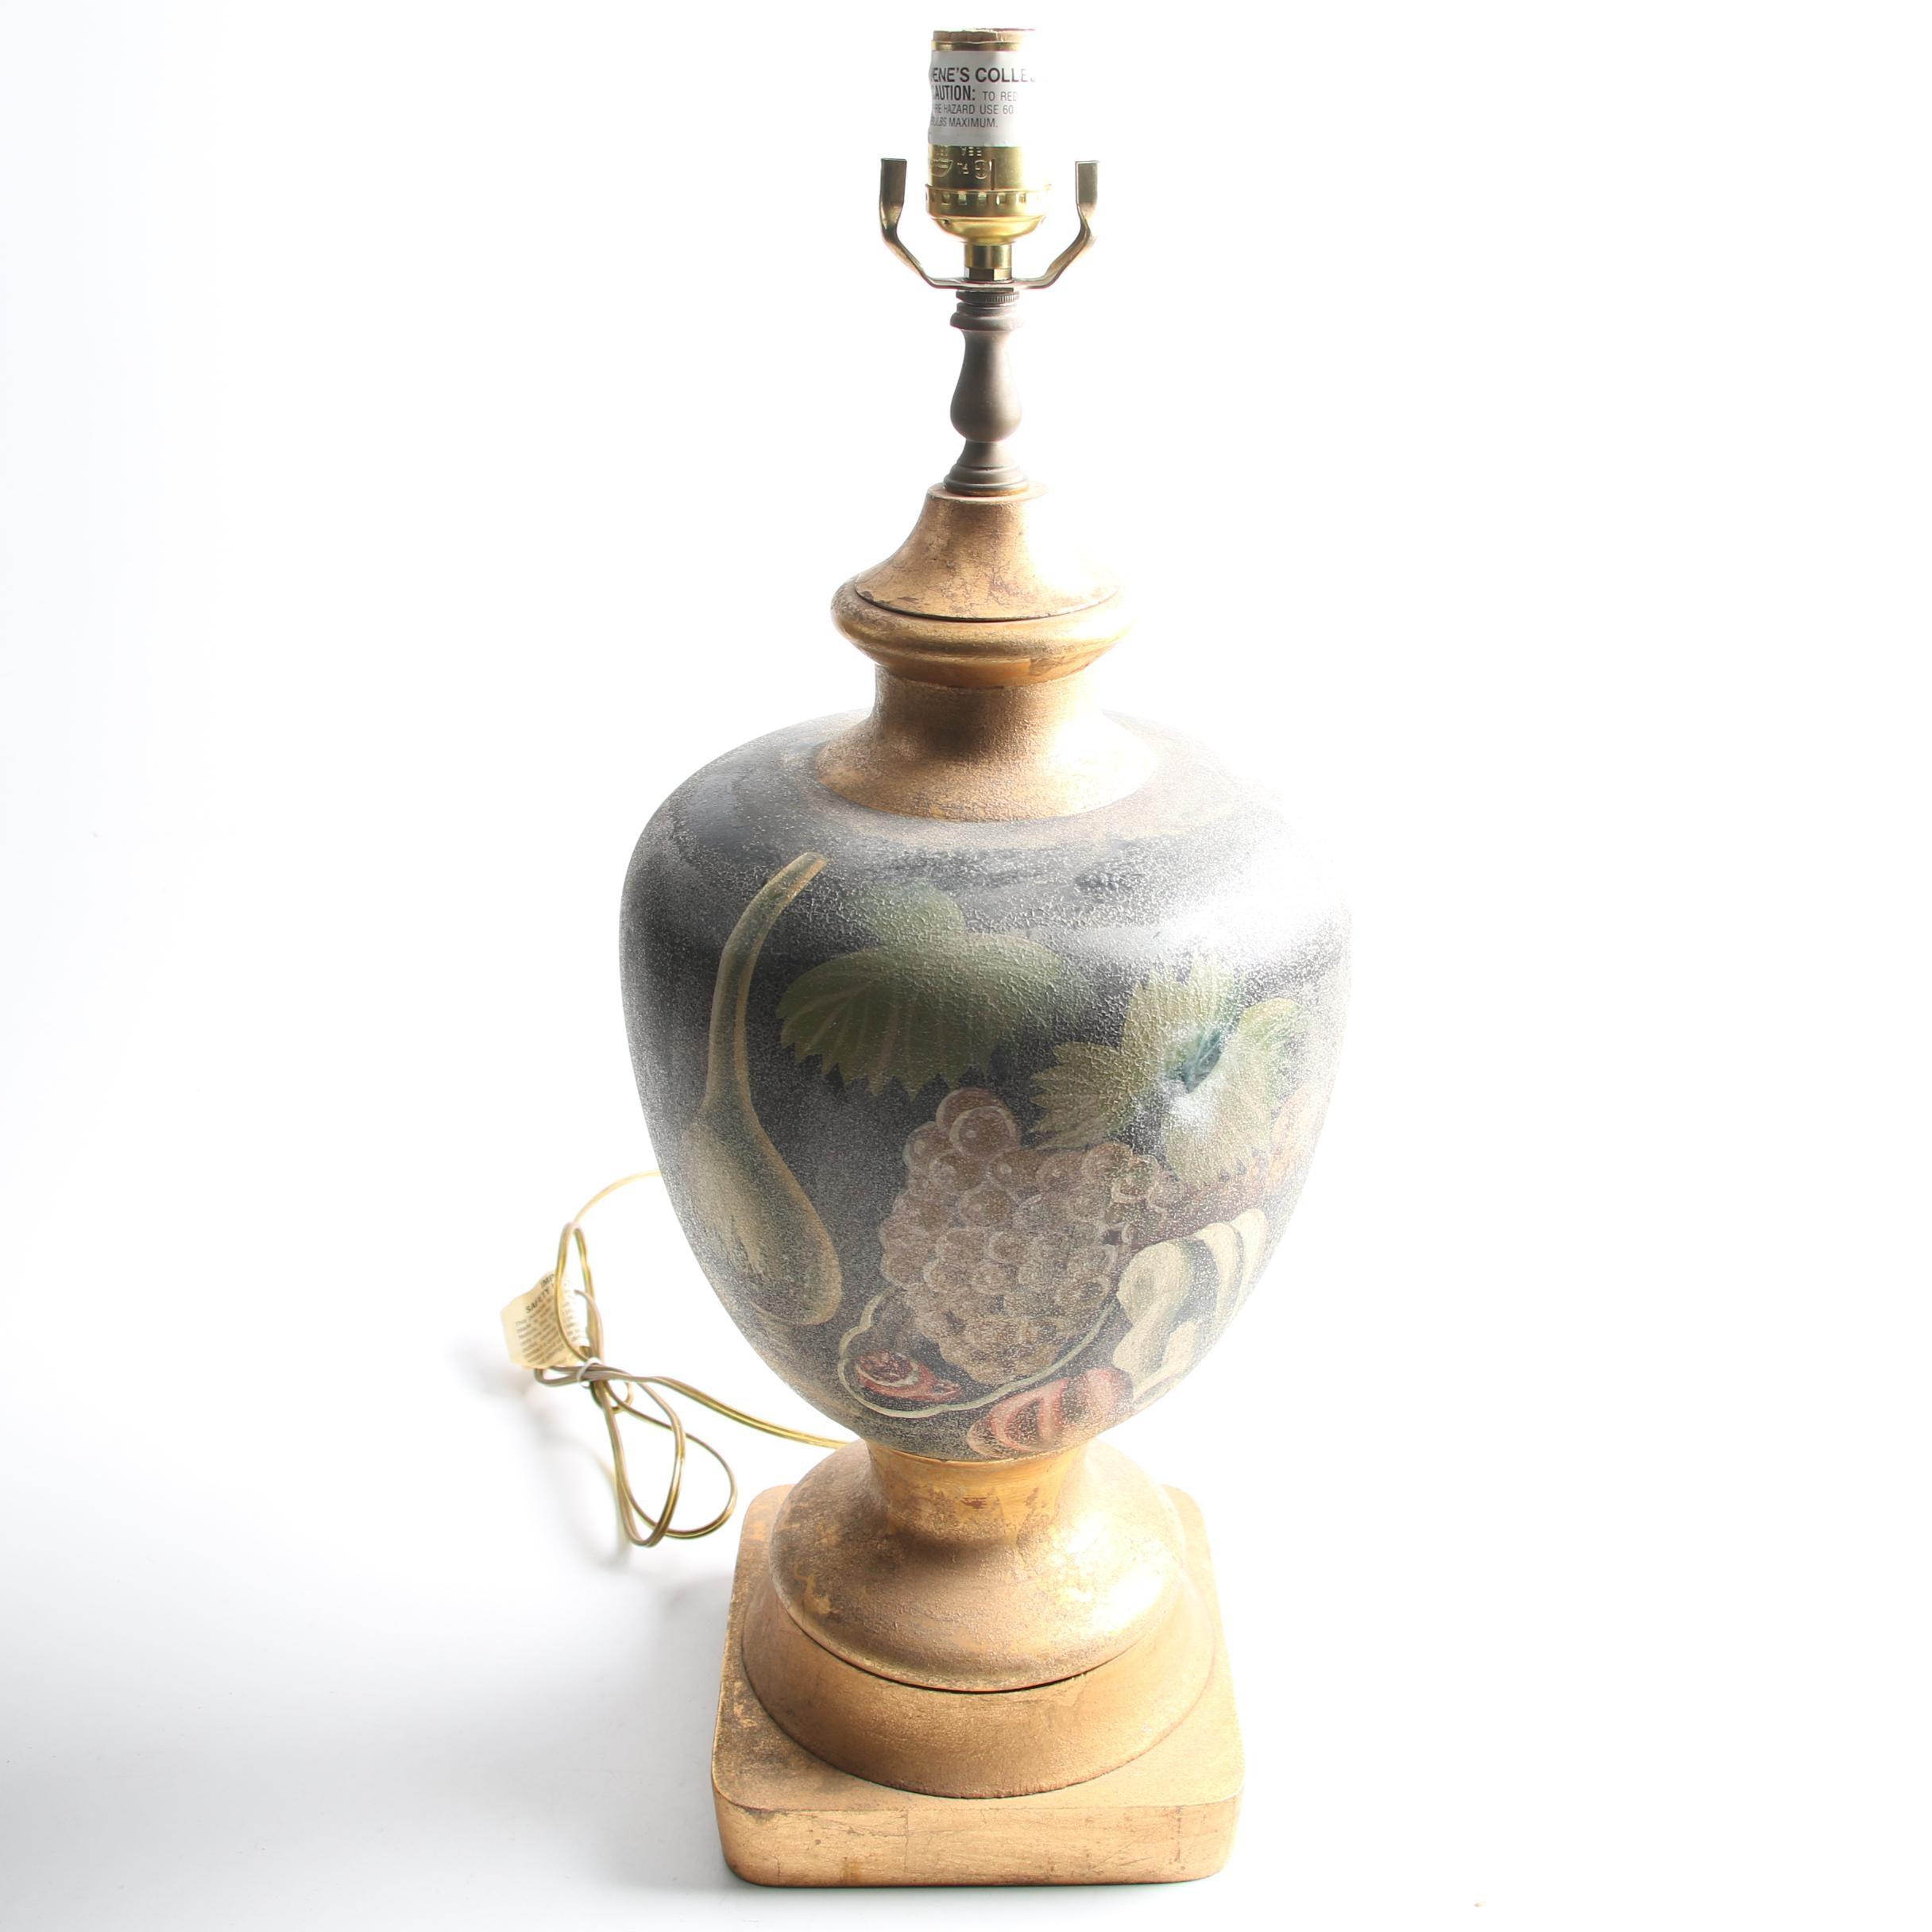 Urn Shaped Ceramic Table Lamp